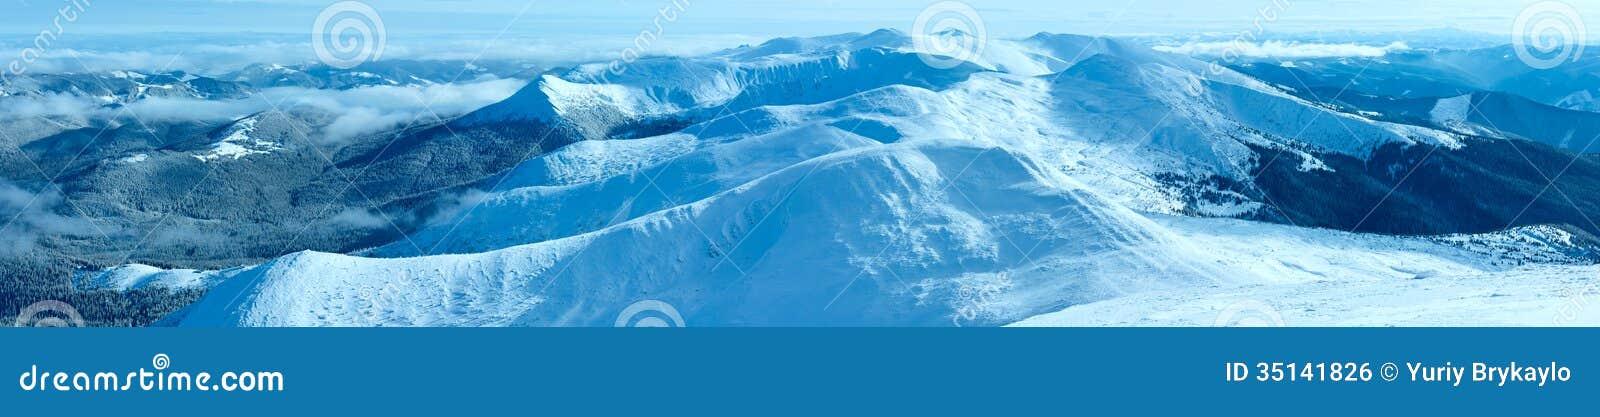 Carpathian panorama för morgonvinterberg (, Ukraina).